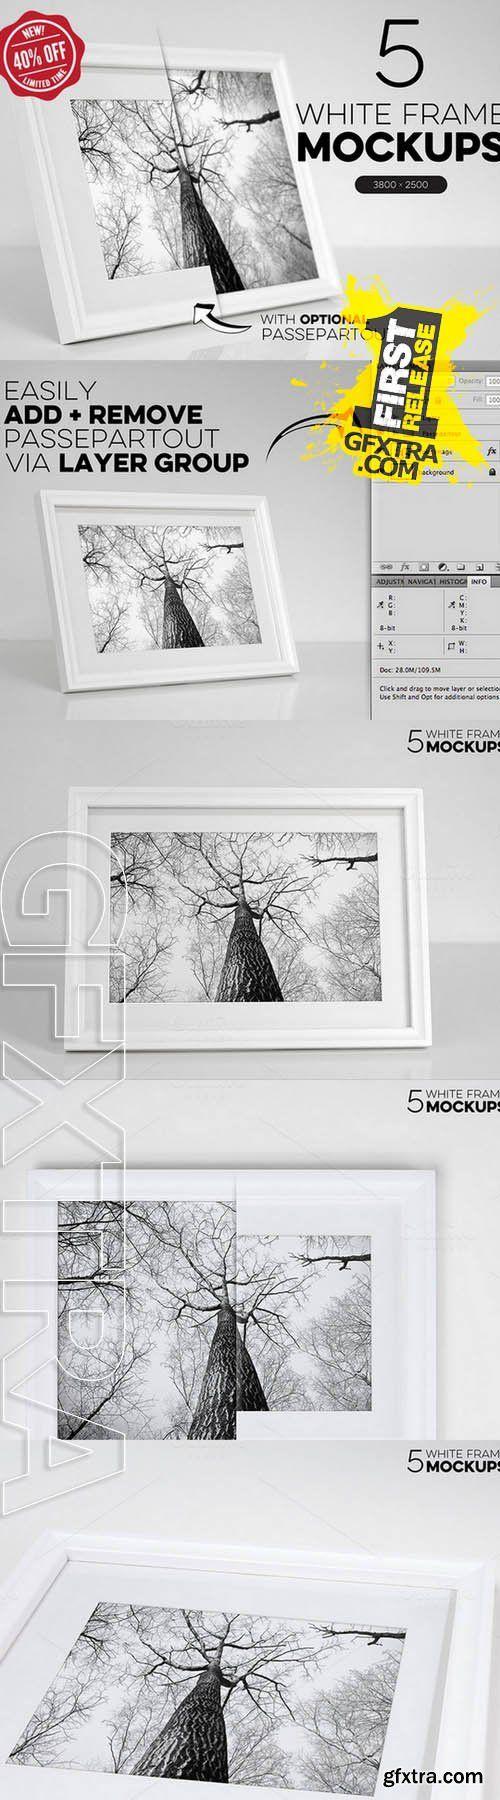 Bundle of 5 White Frame Mockups - Creativemarket 72044